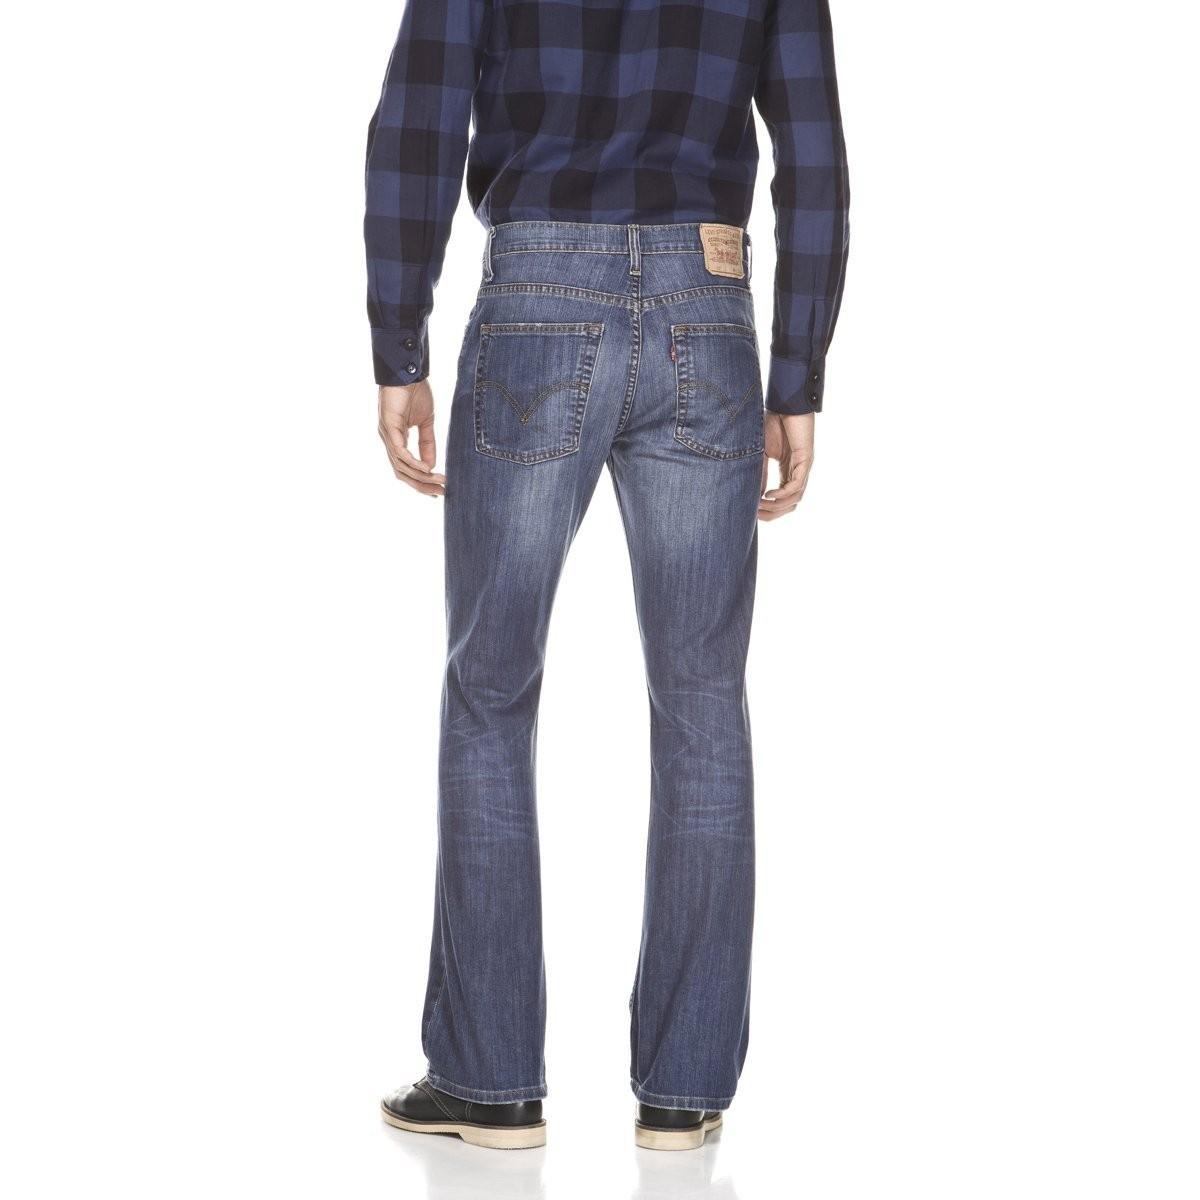 Levis® Herren-Jeans 527 - Low Bootcut - Blau